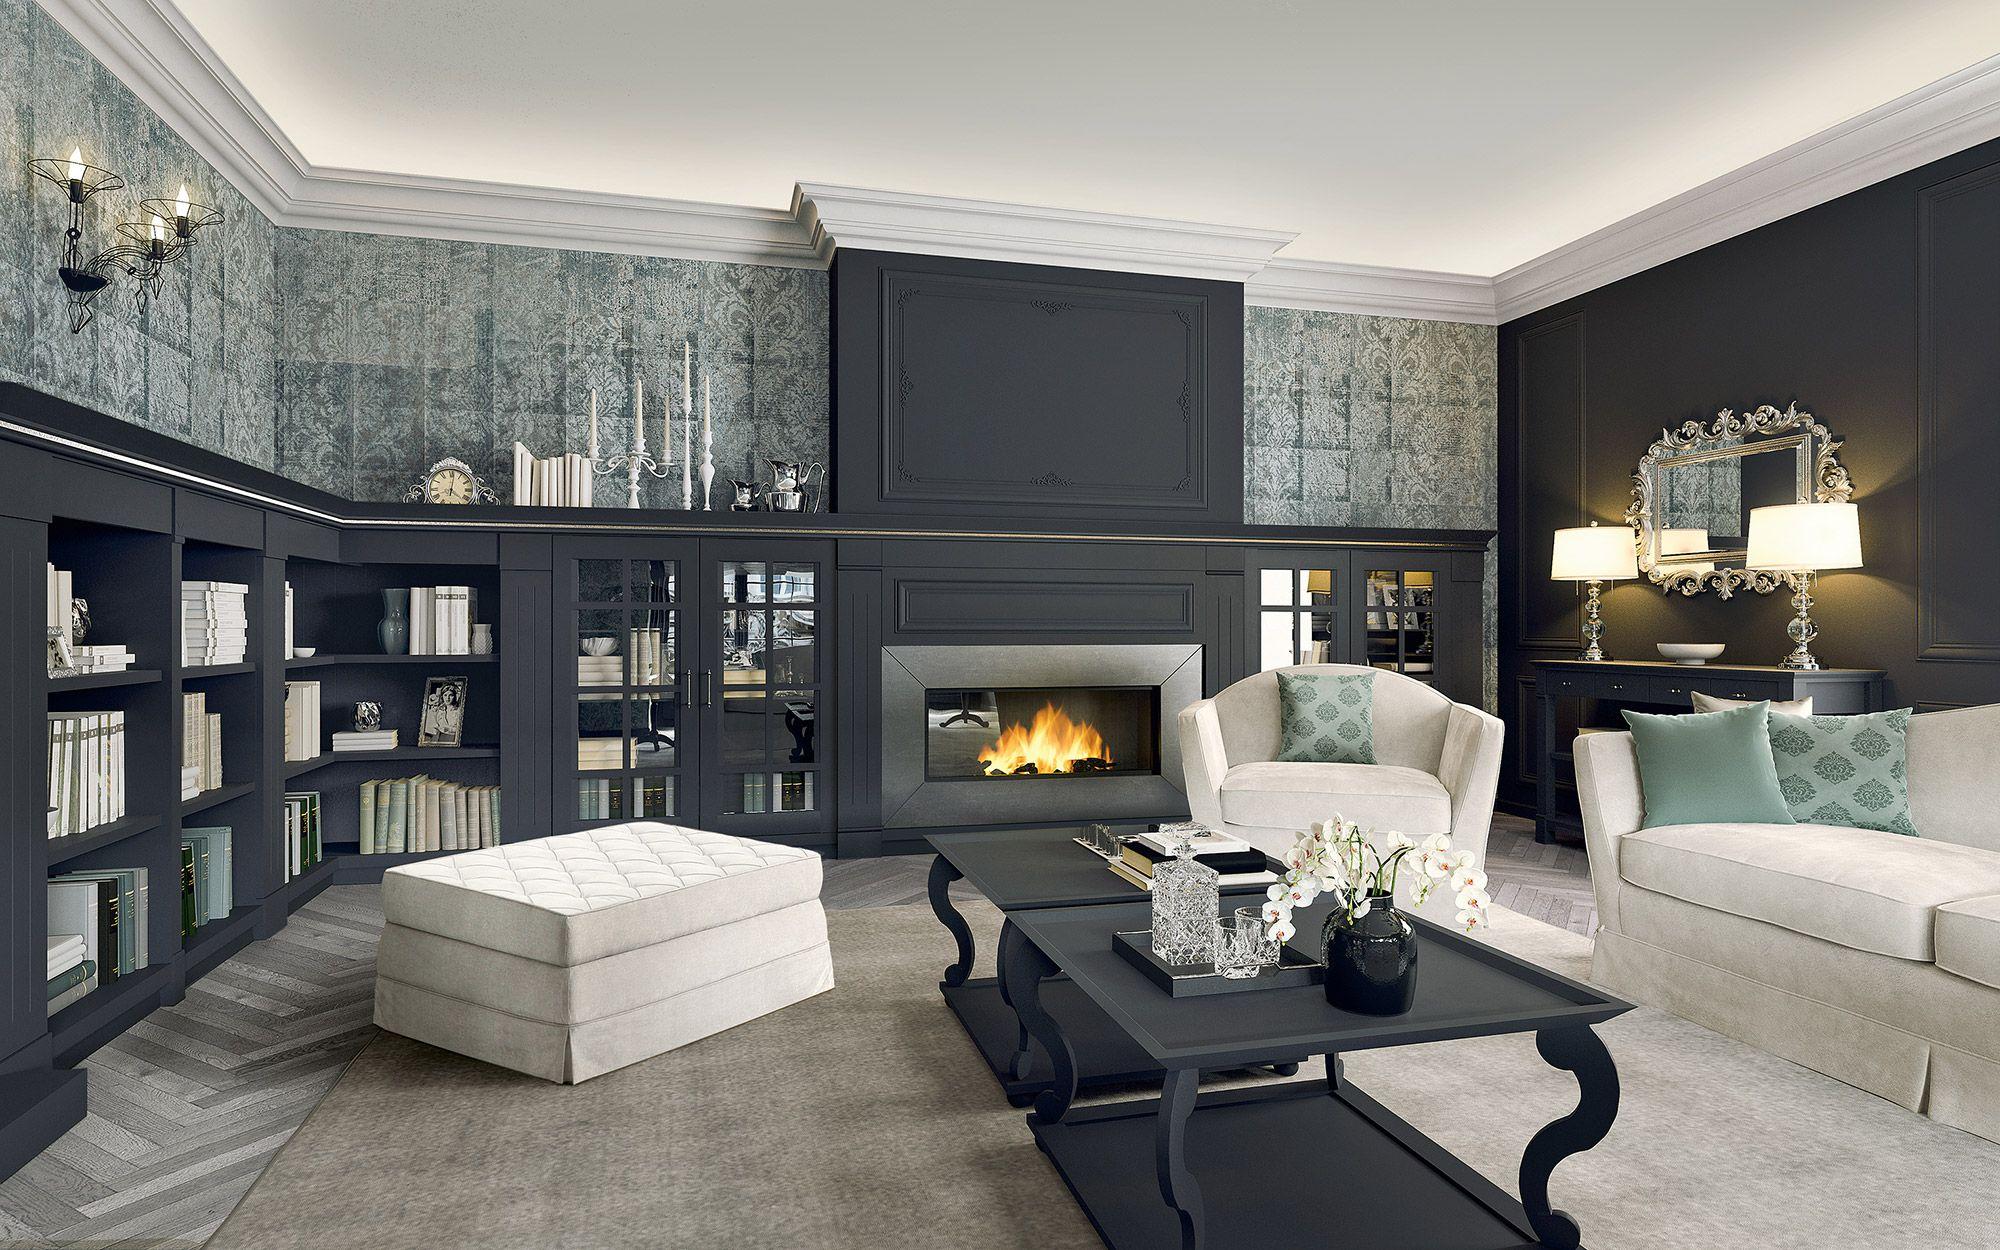 English Mood Living Room by Minacciolo 2016 #englishmood ...